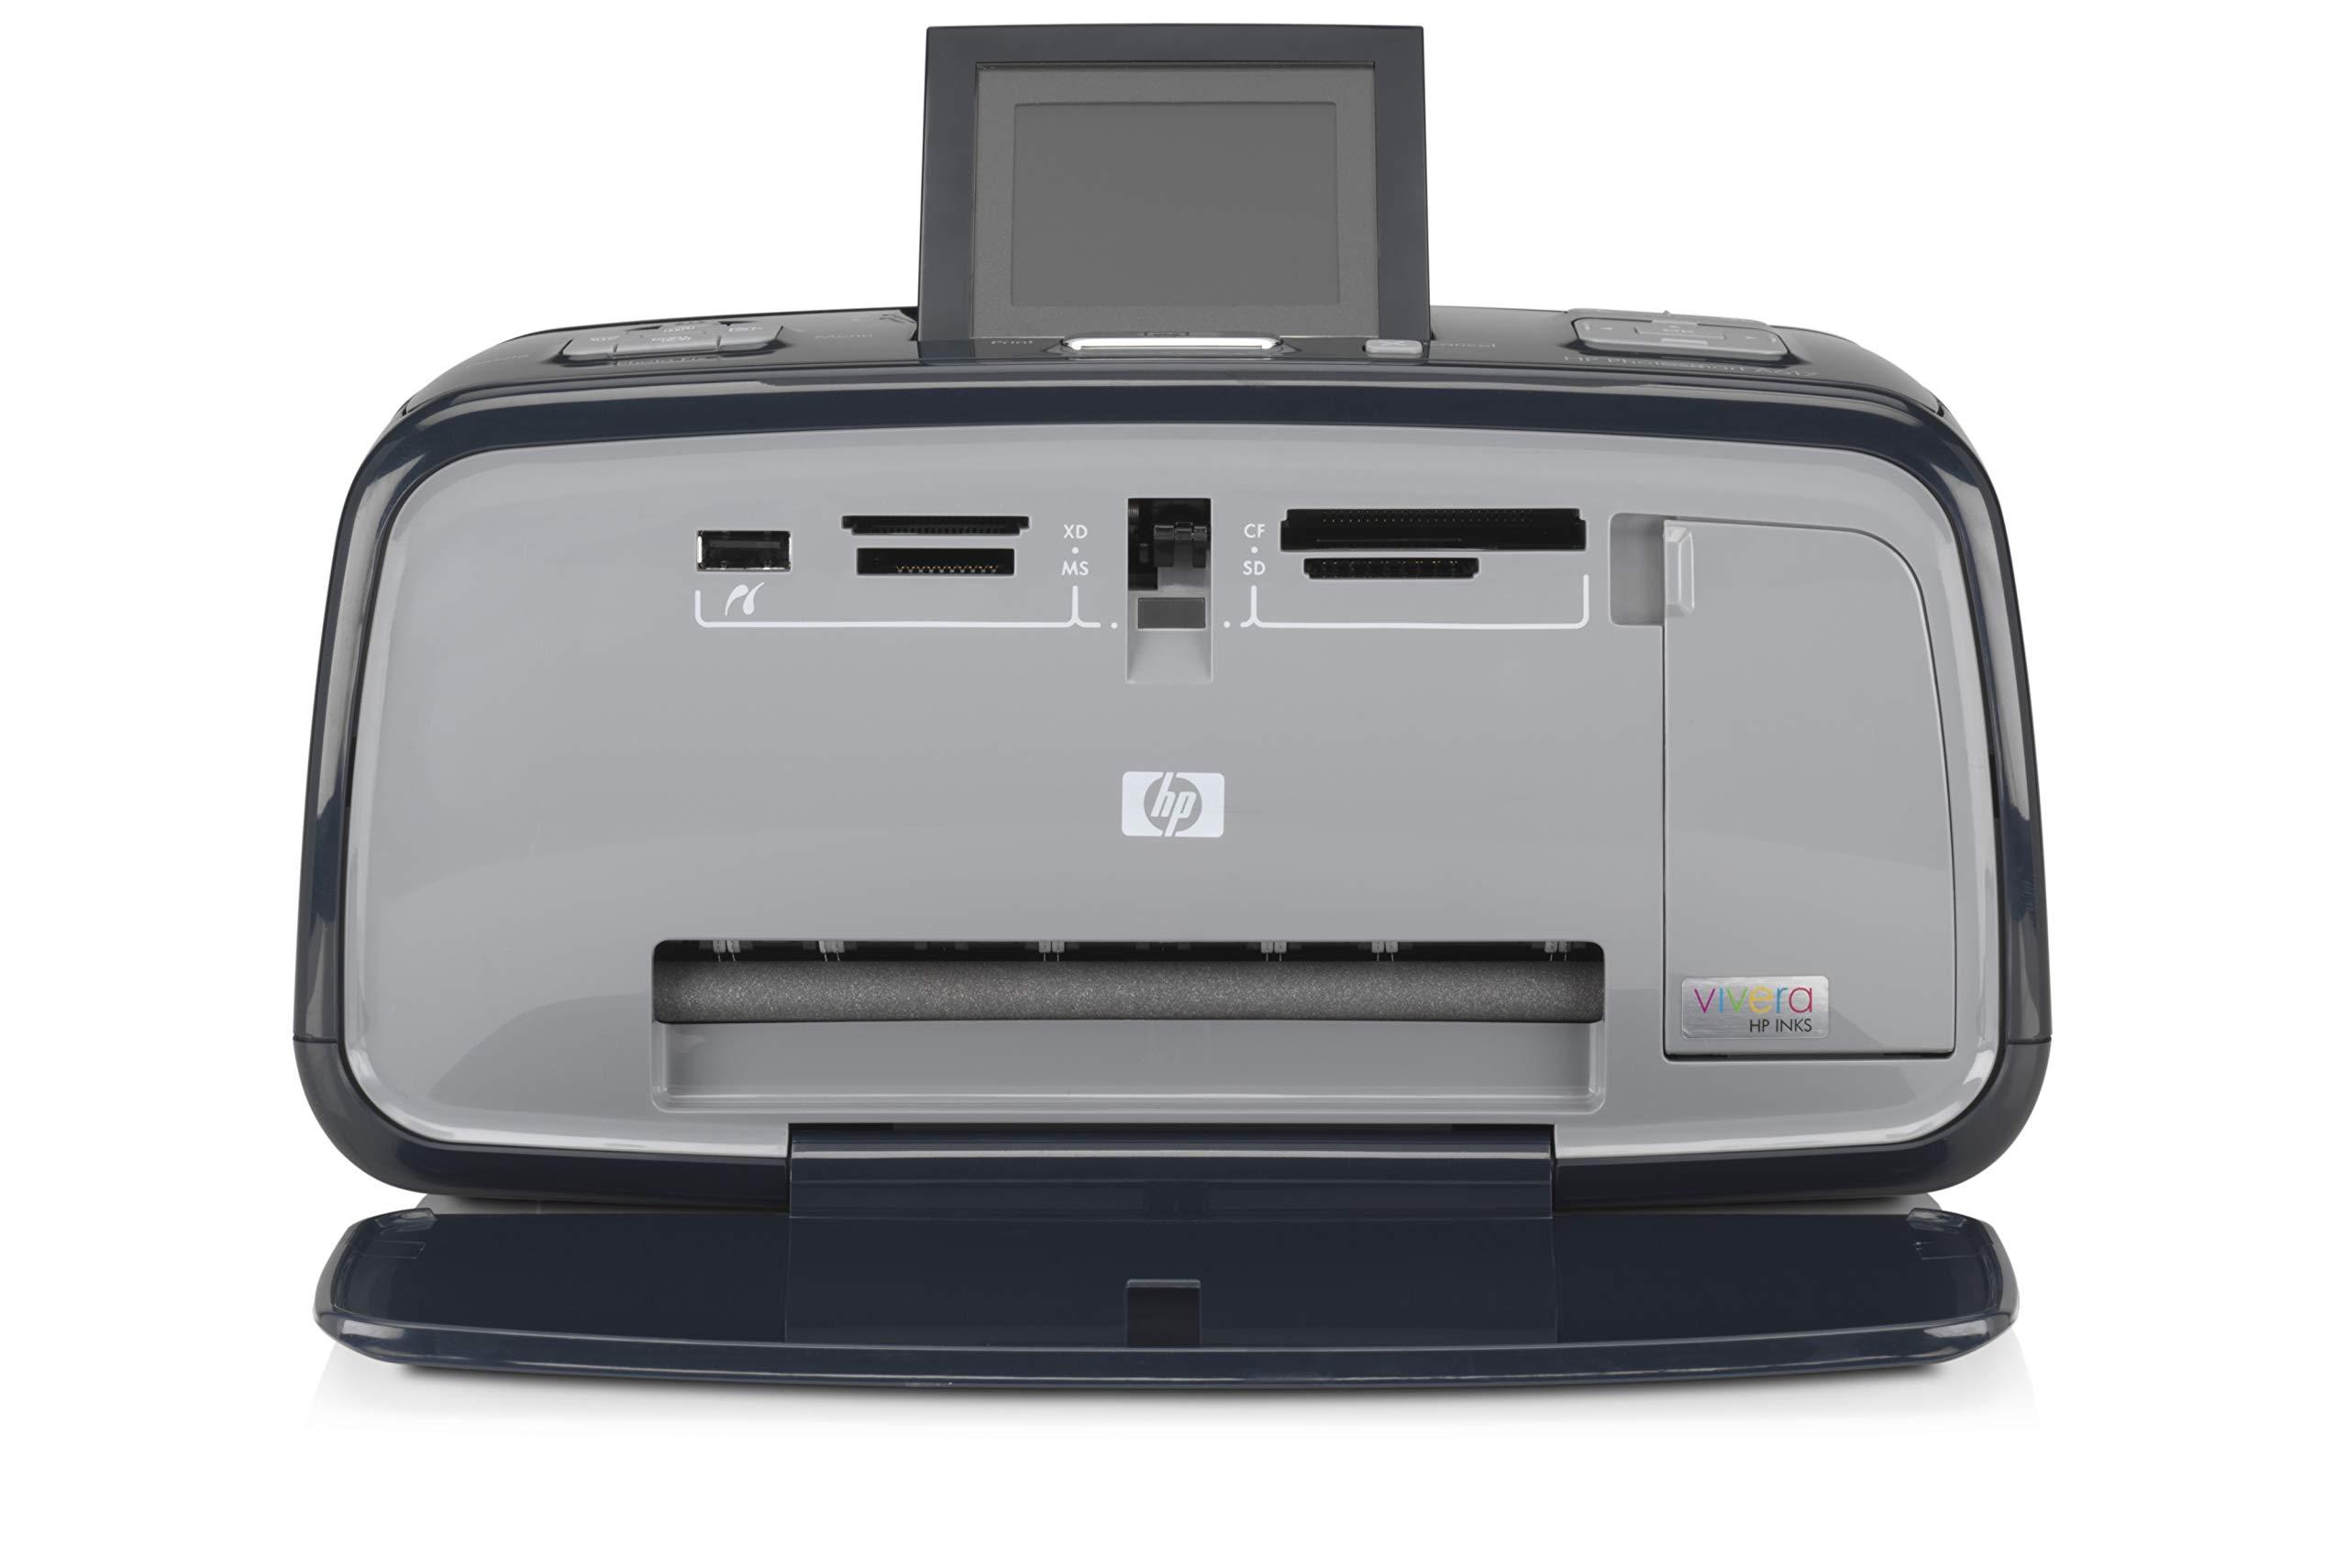 HP Photosmart A617 Compact Photo Printer by HP